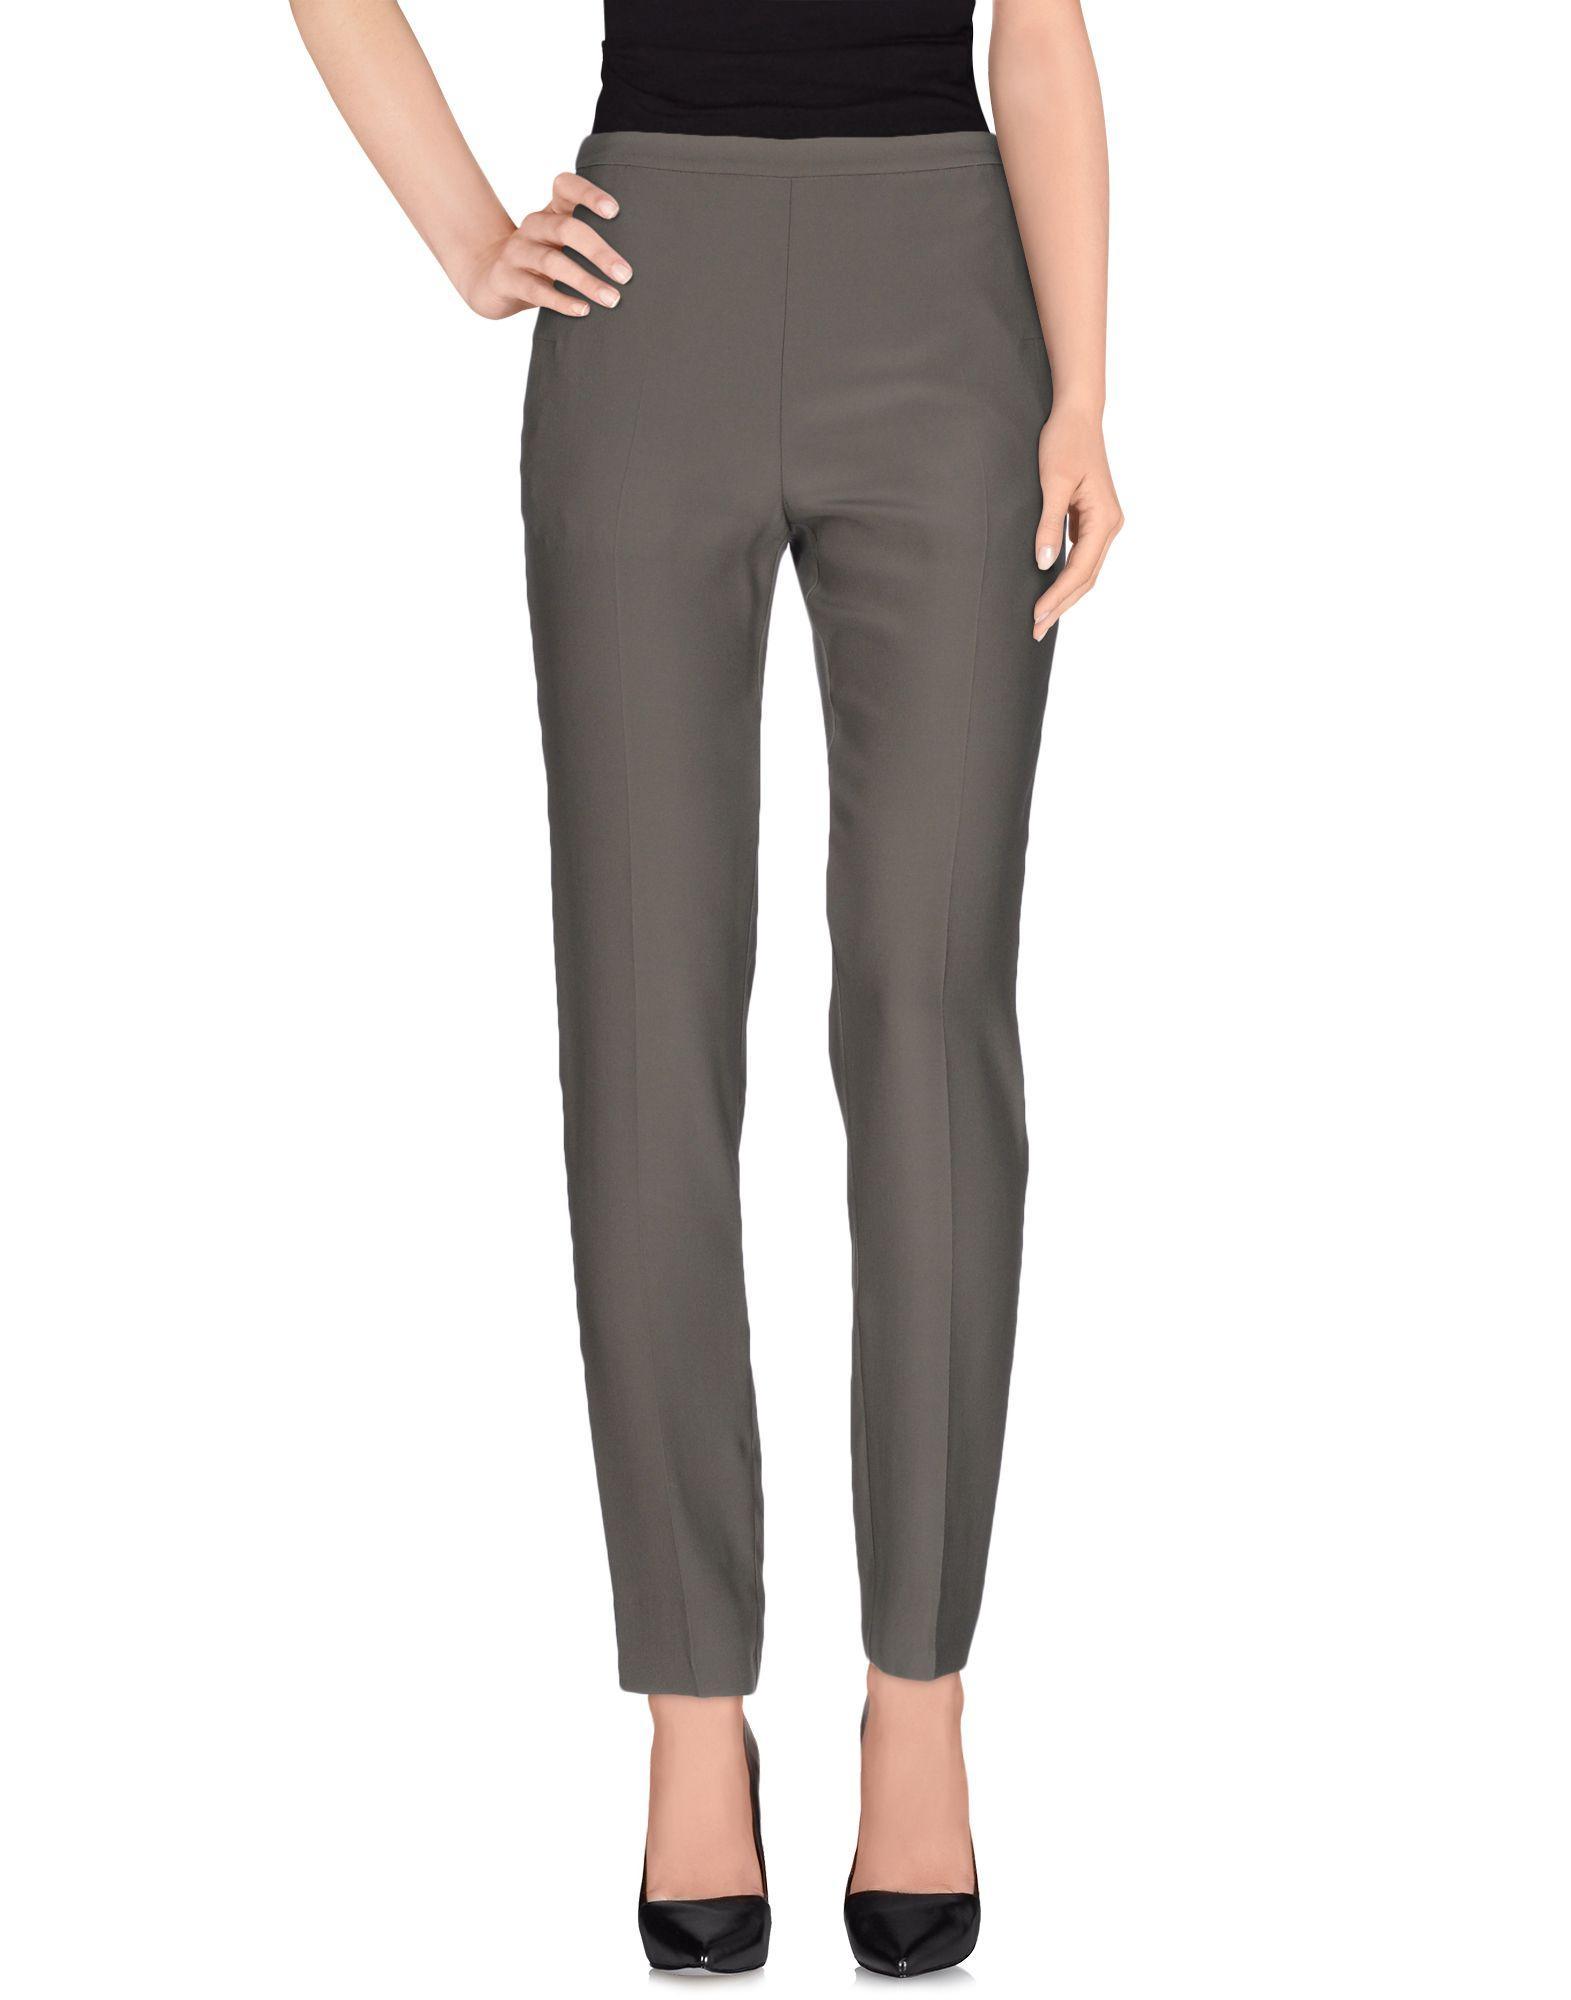 Maison margiela casual trouser in gray lyst for 10 moulmein rise la maison